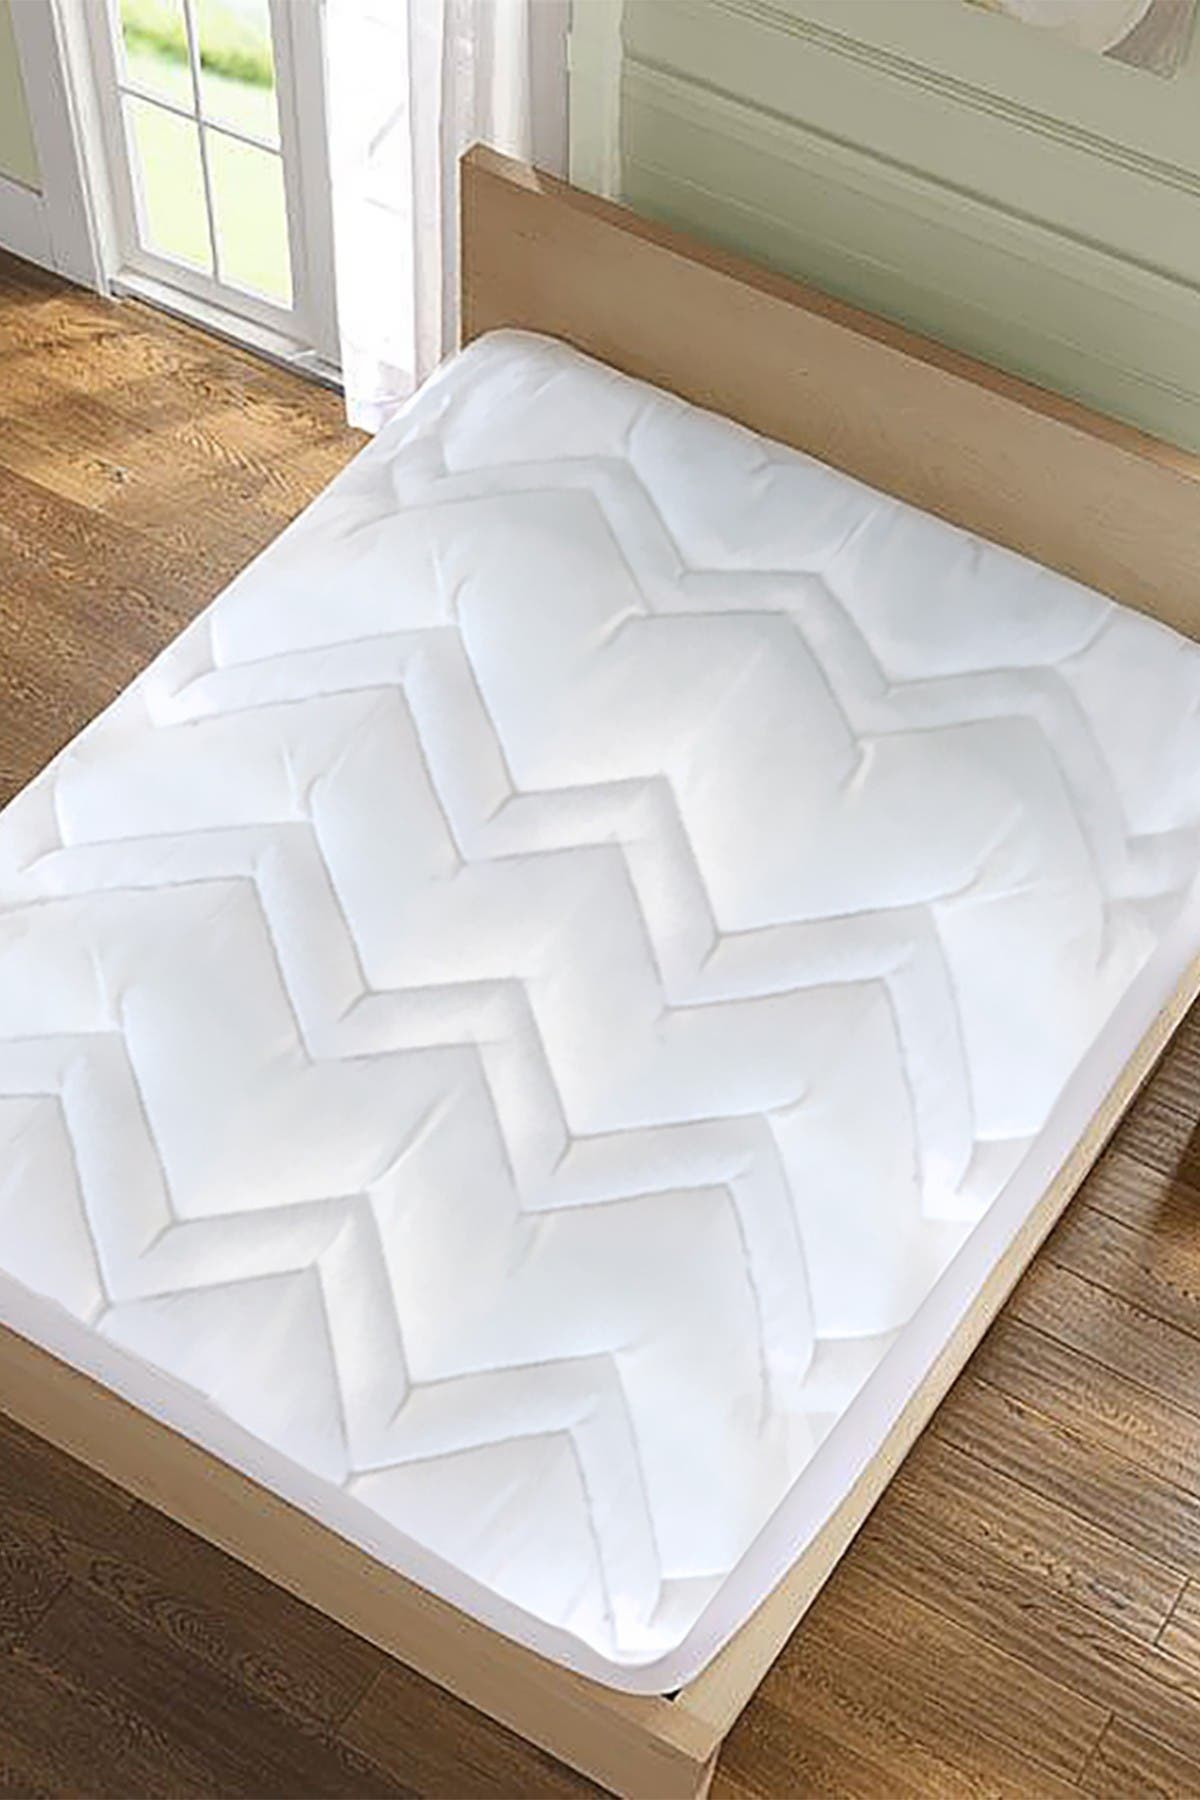 Image of Blue Ridge Home Fashions King Kathy Ireland Home Classic Microfiber Mattress Pad - White